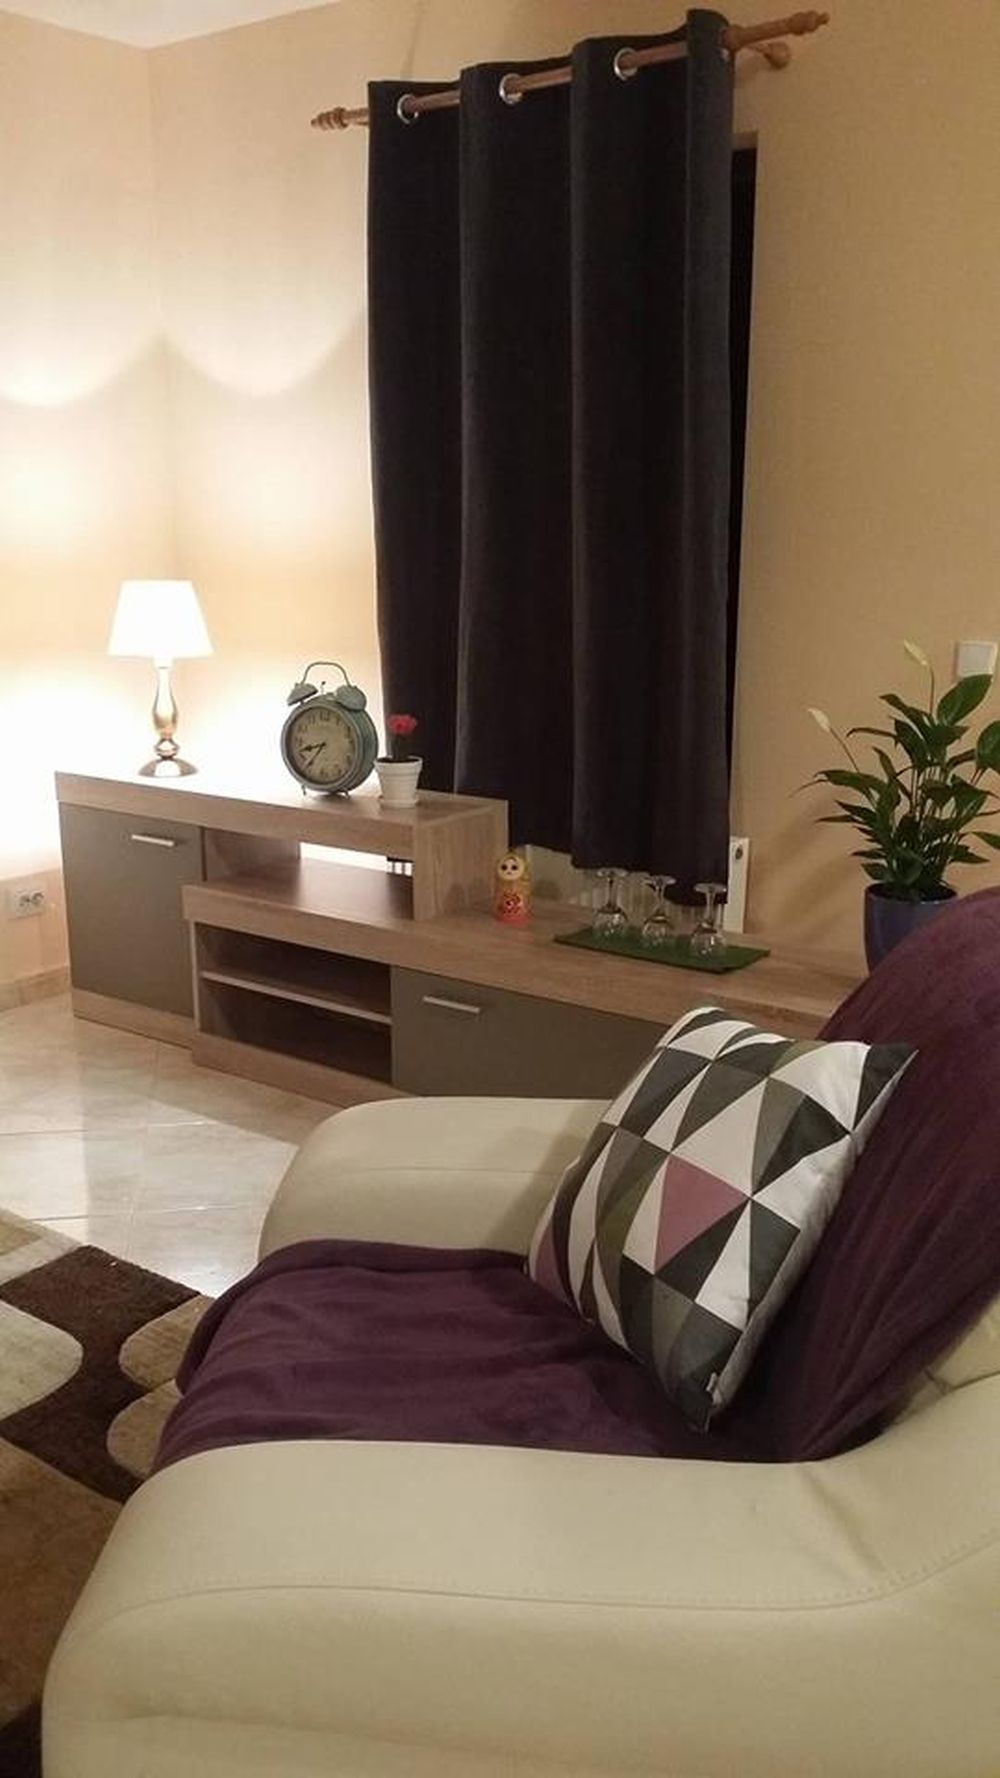 adelaparvu.com despre redecorare apartament inchiriat, Foto arh Bogdan Balaban (1)